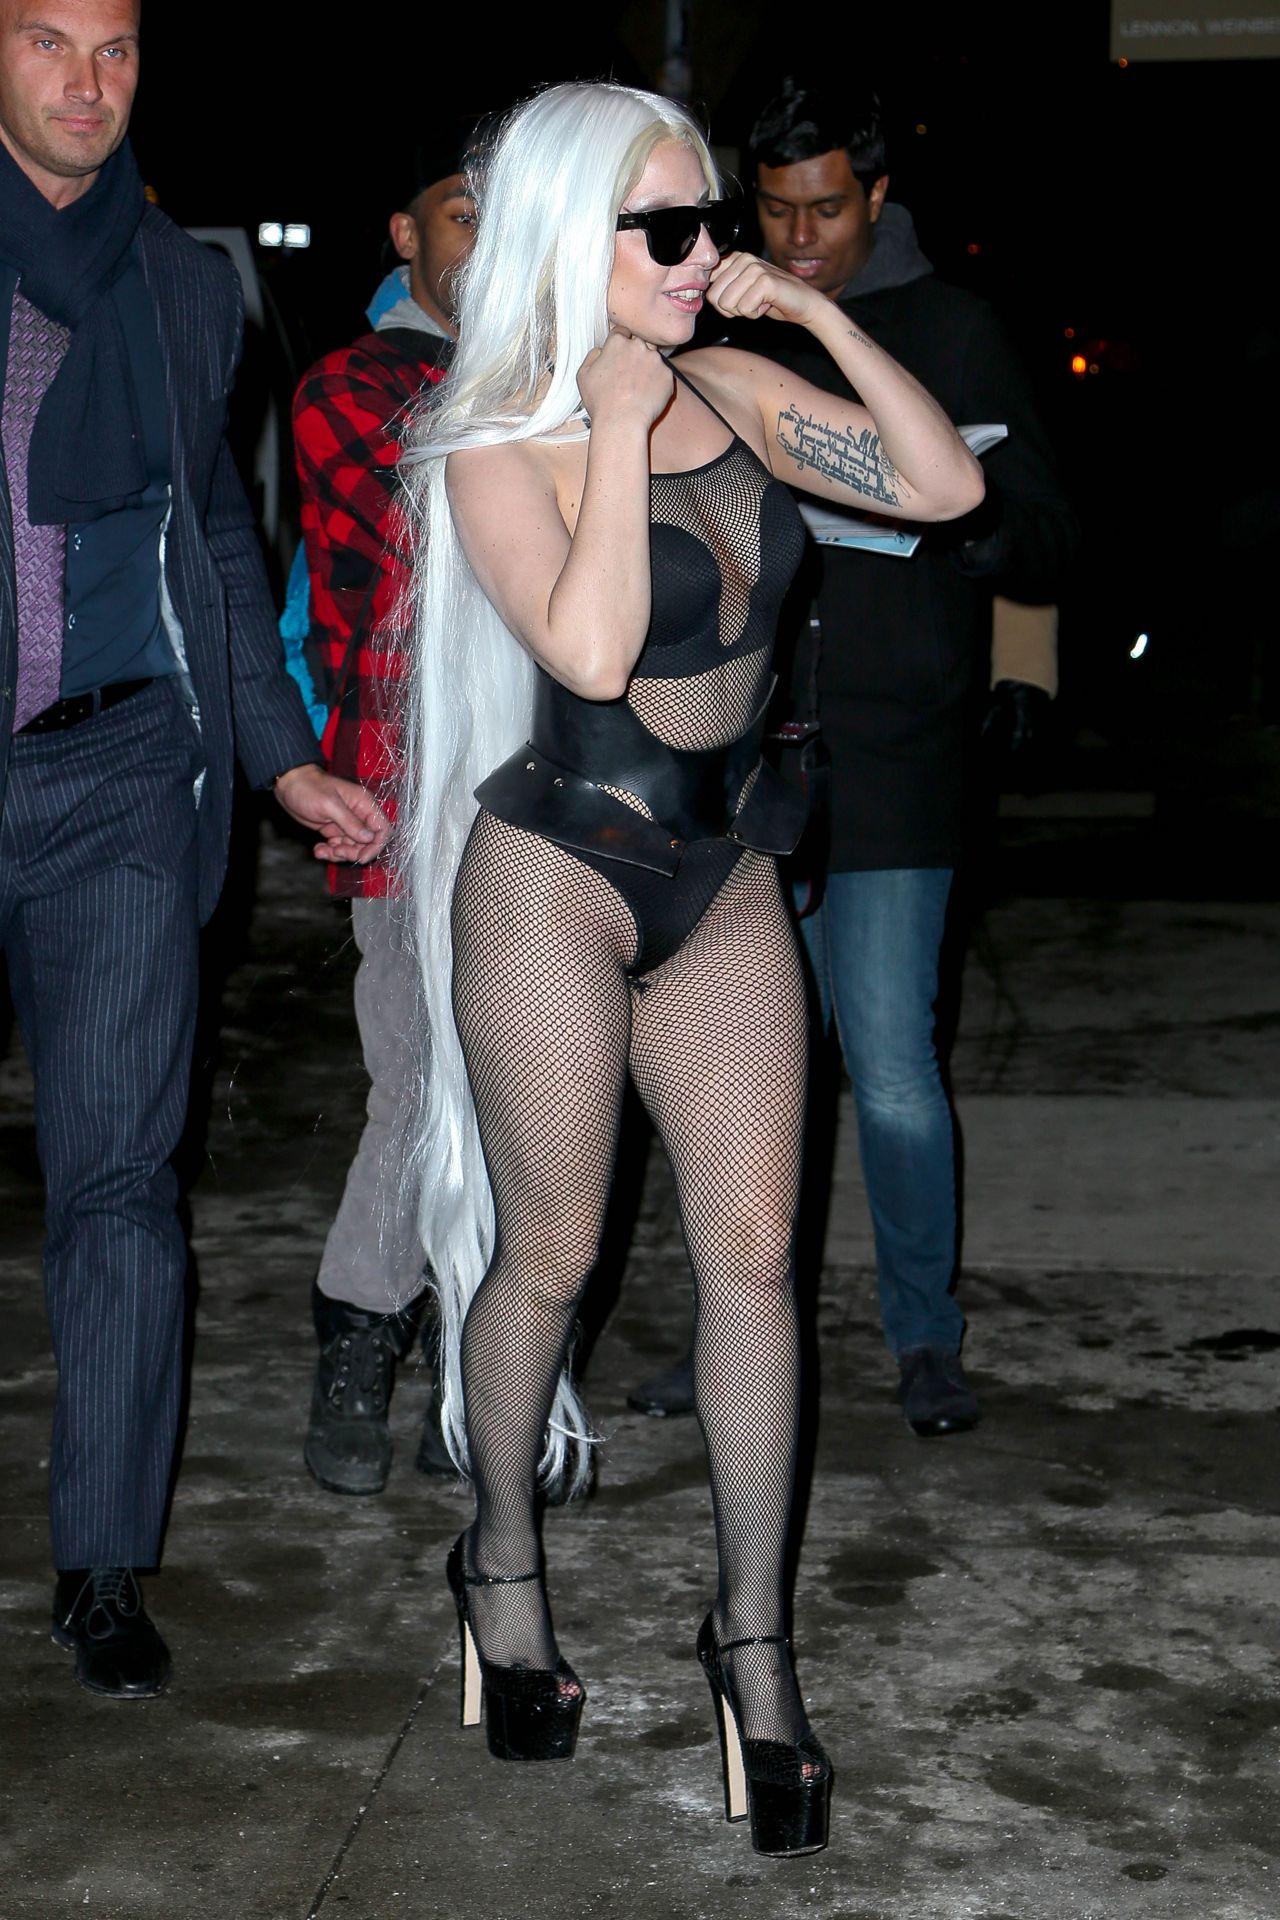 lady-gaga-in-new-york-city-february-2014